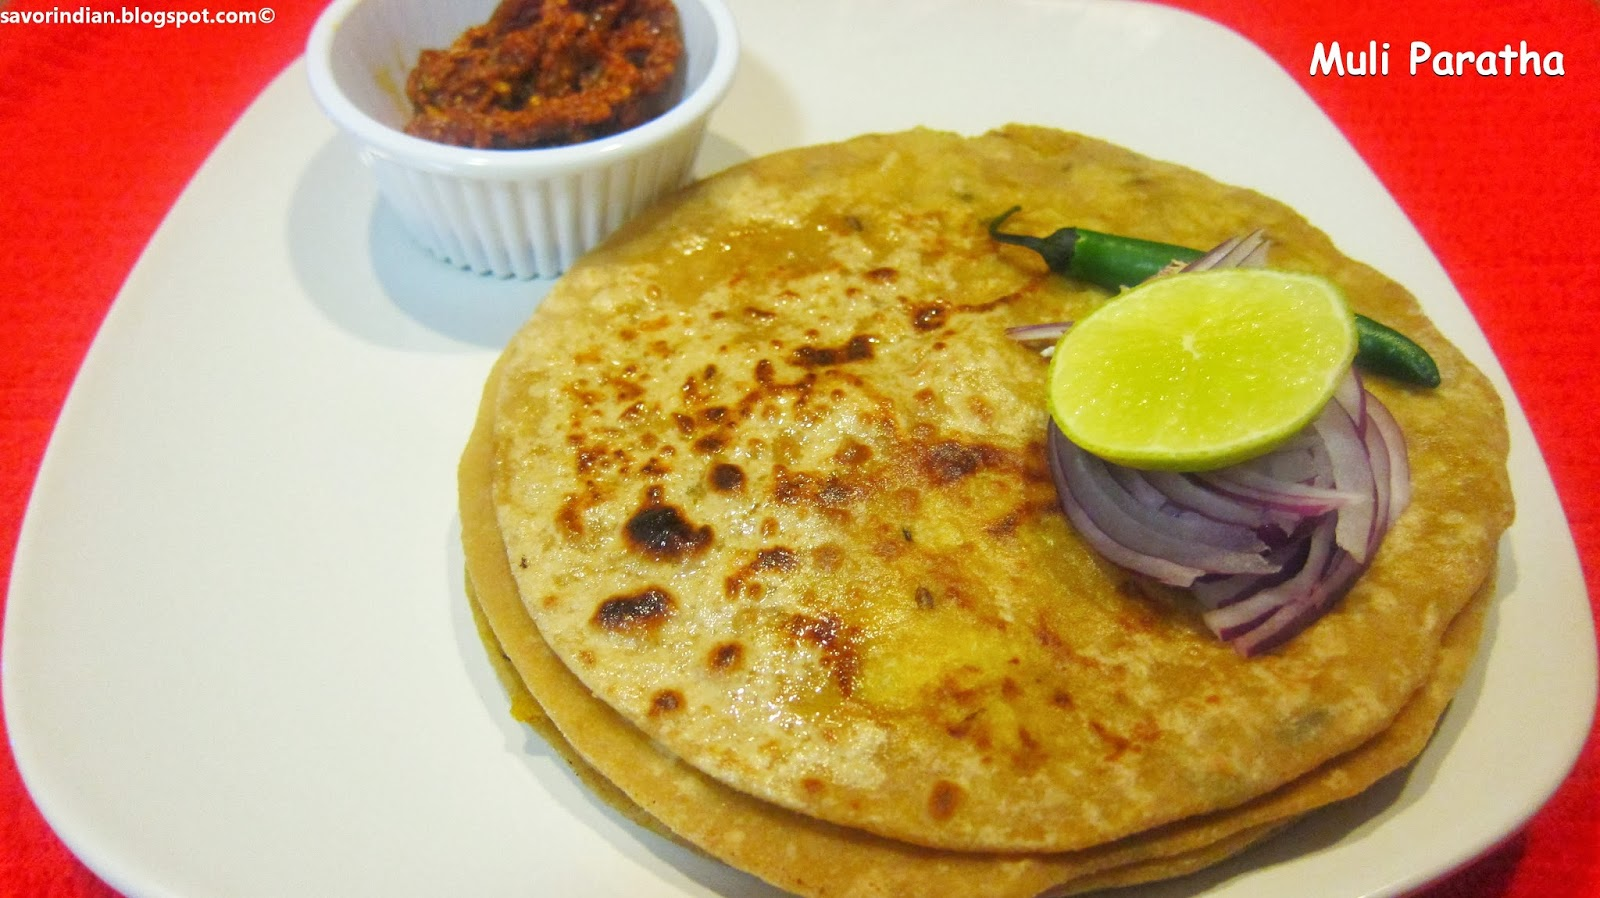 Muli/Mooli Paratha (Radish Paratha) Recipe